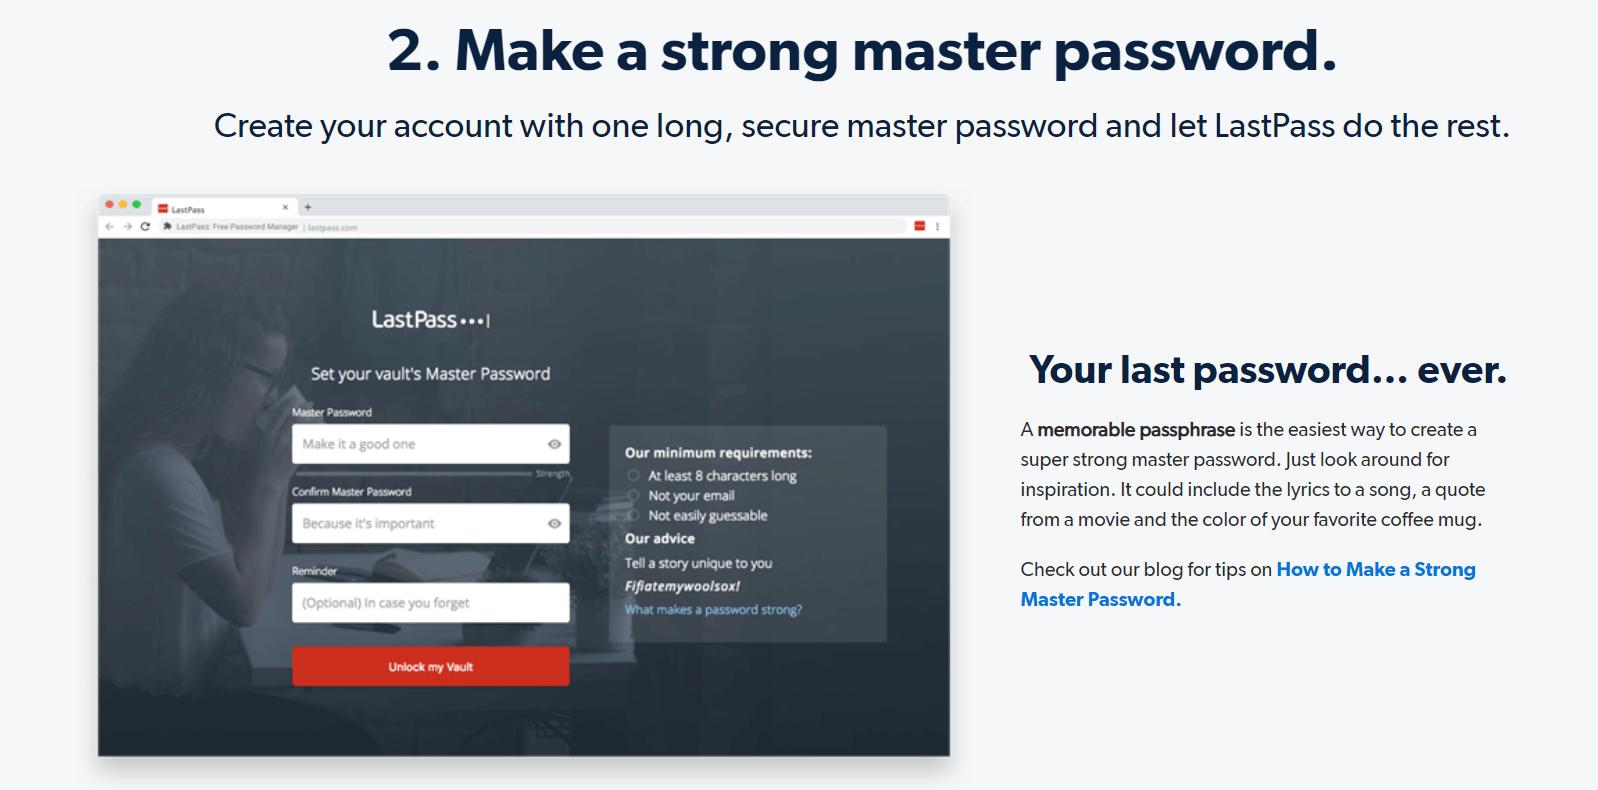 Make a strong master password.